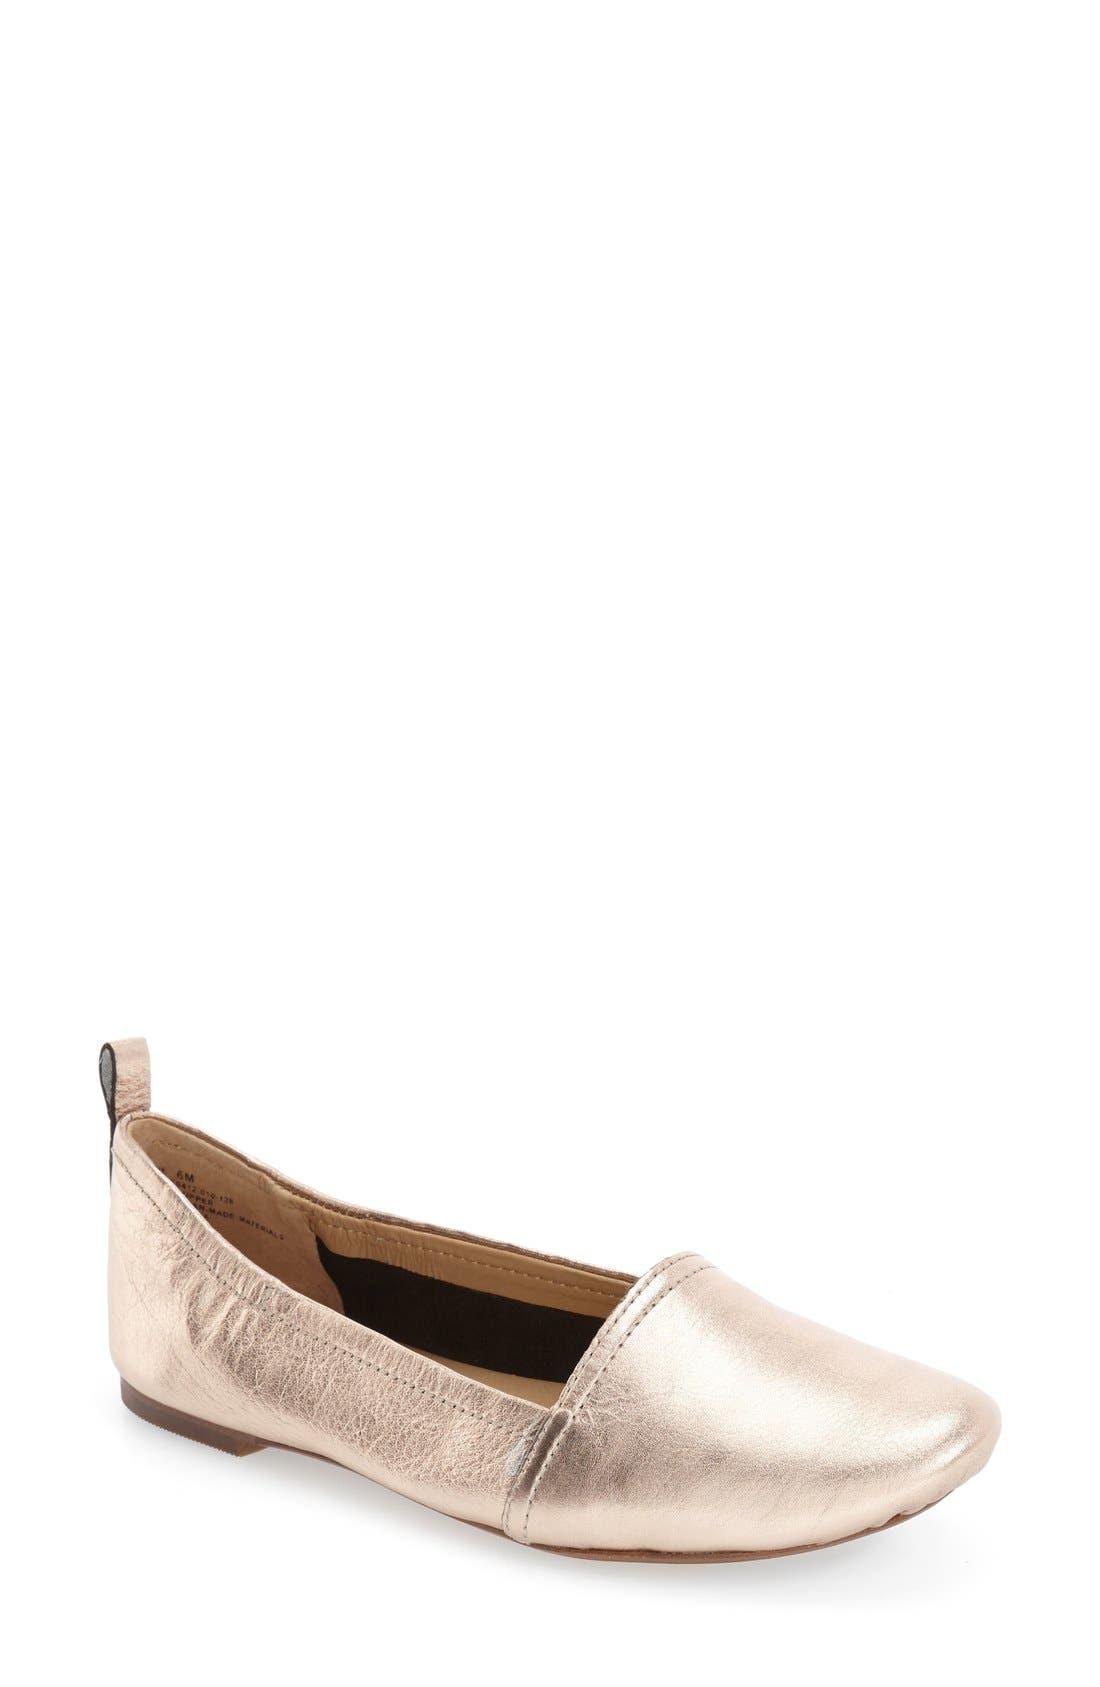 Main Image - Latigo 'Bettie' Leather Flat (Women)